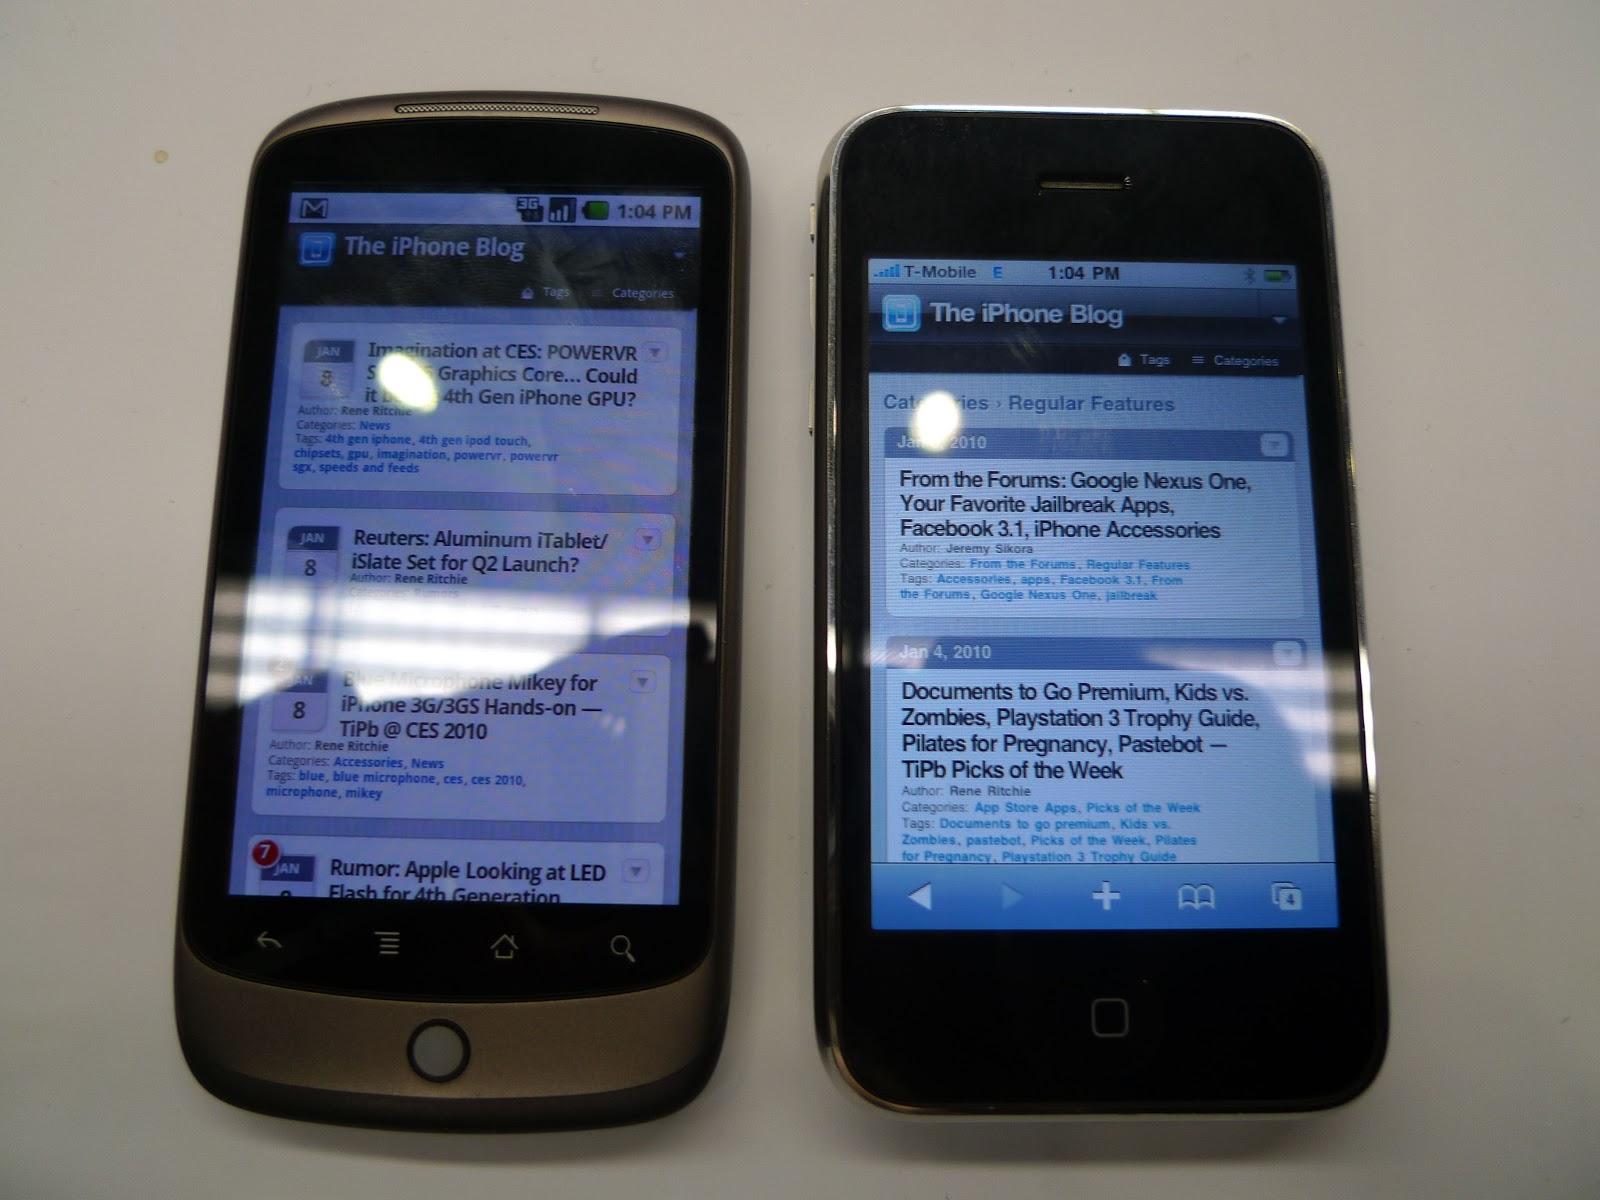 http://3.bp.blogspot.com/_j0AQI9iPDac/TCAoMTDrcqI/AAAAAAAAAvg/0zOHdHFaHAk/s1600/one-iphone.jpg